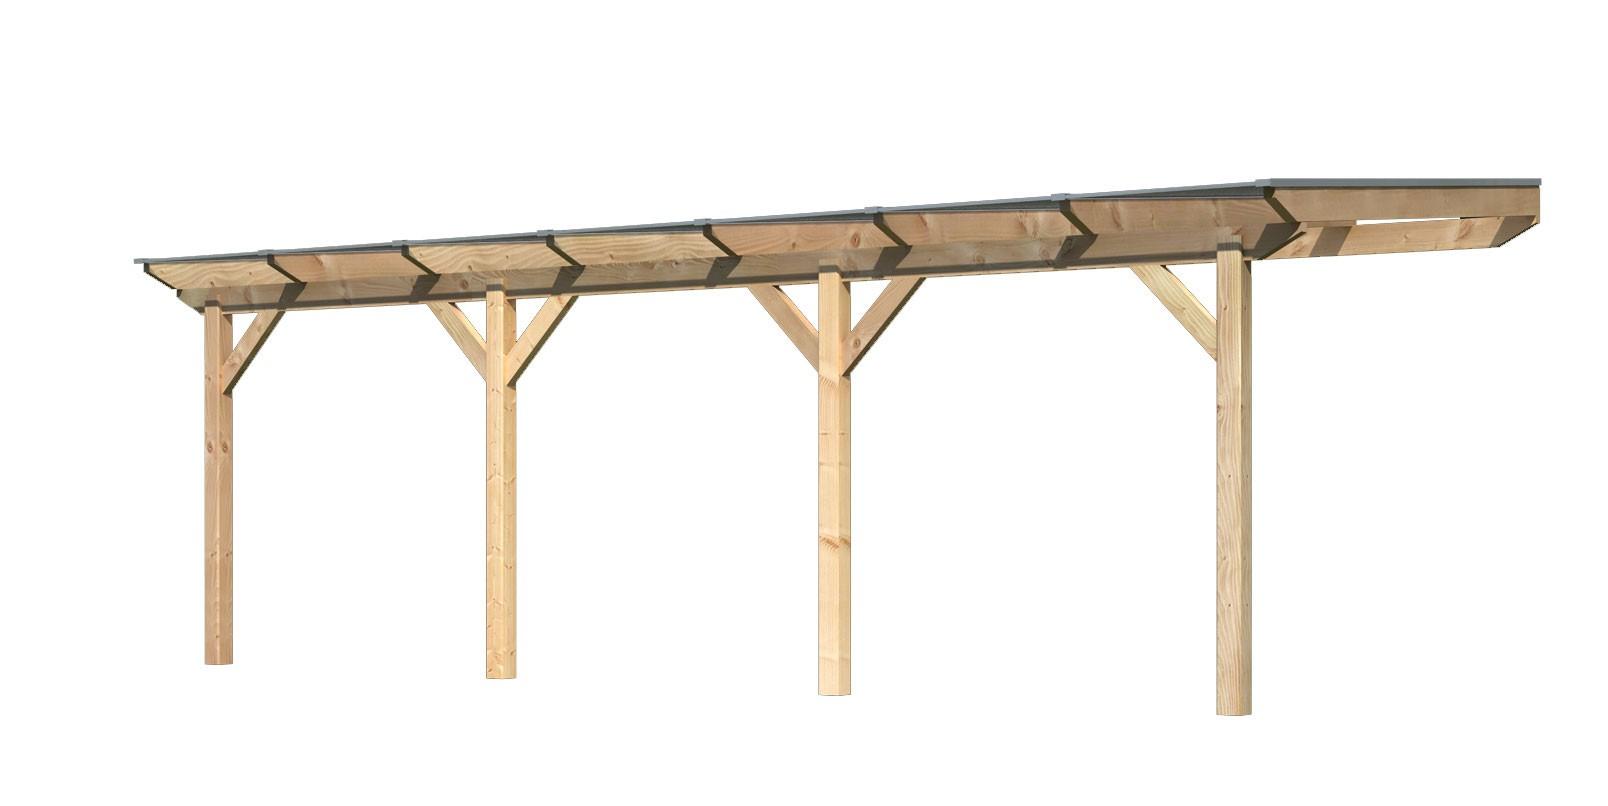 Terrassenüberdachung Karibu Modell 2 C gerade Douglasie 714x300cm Bild 1